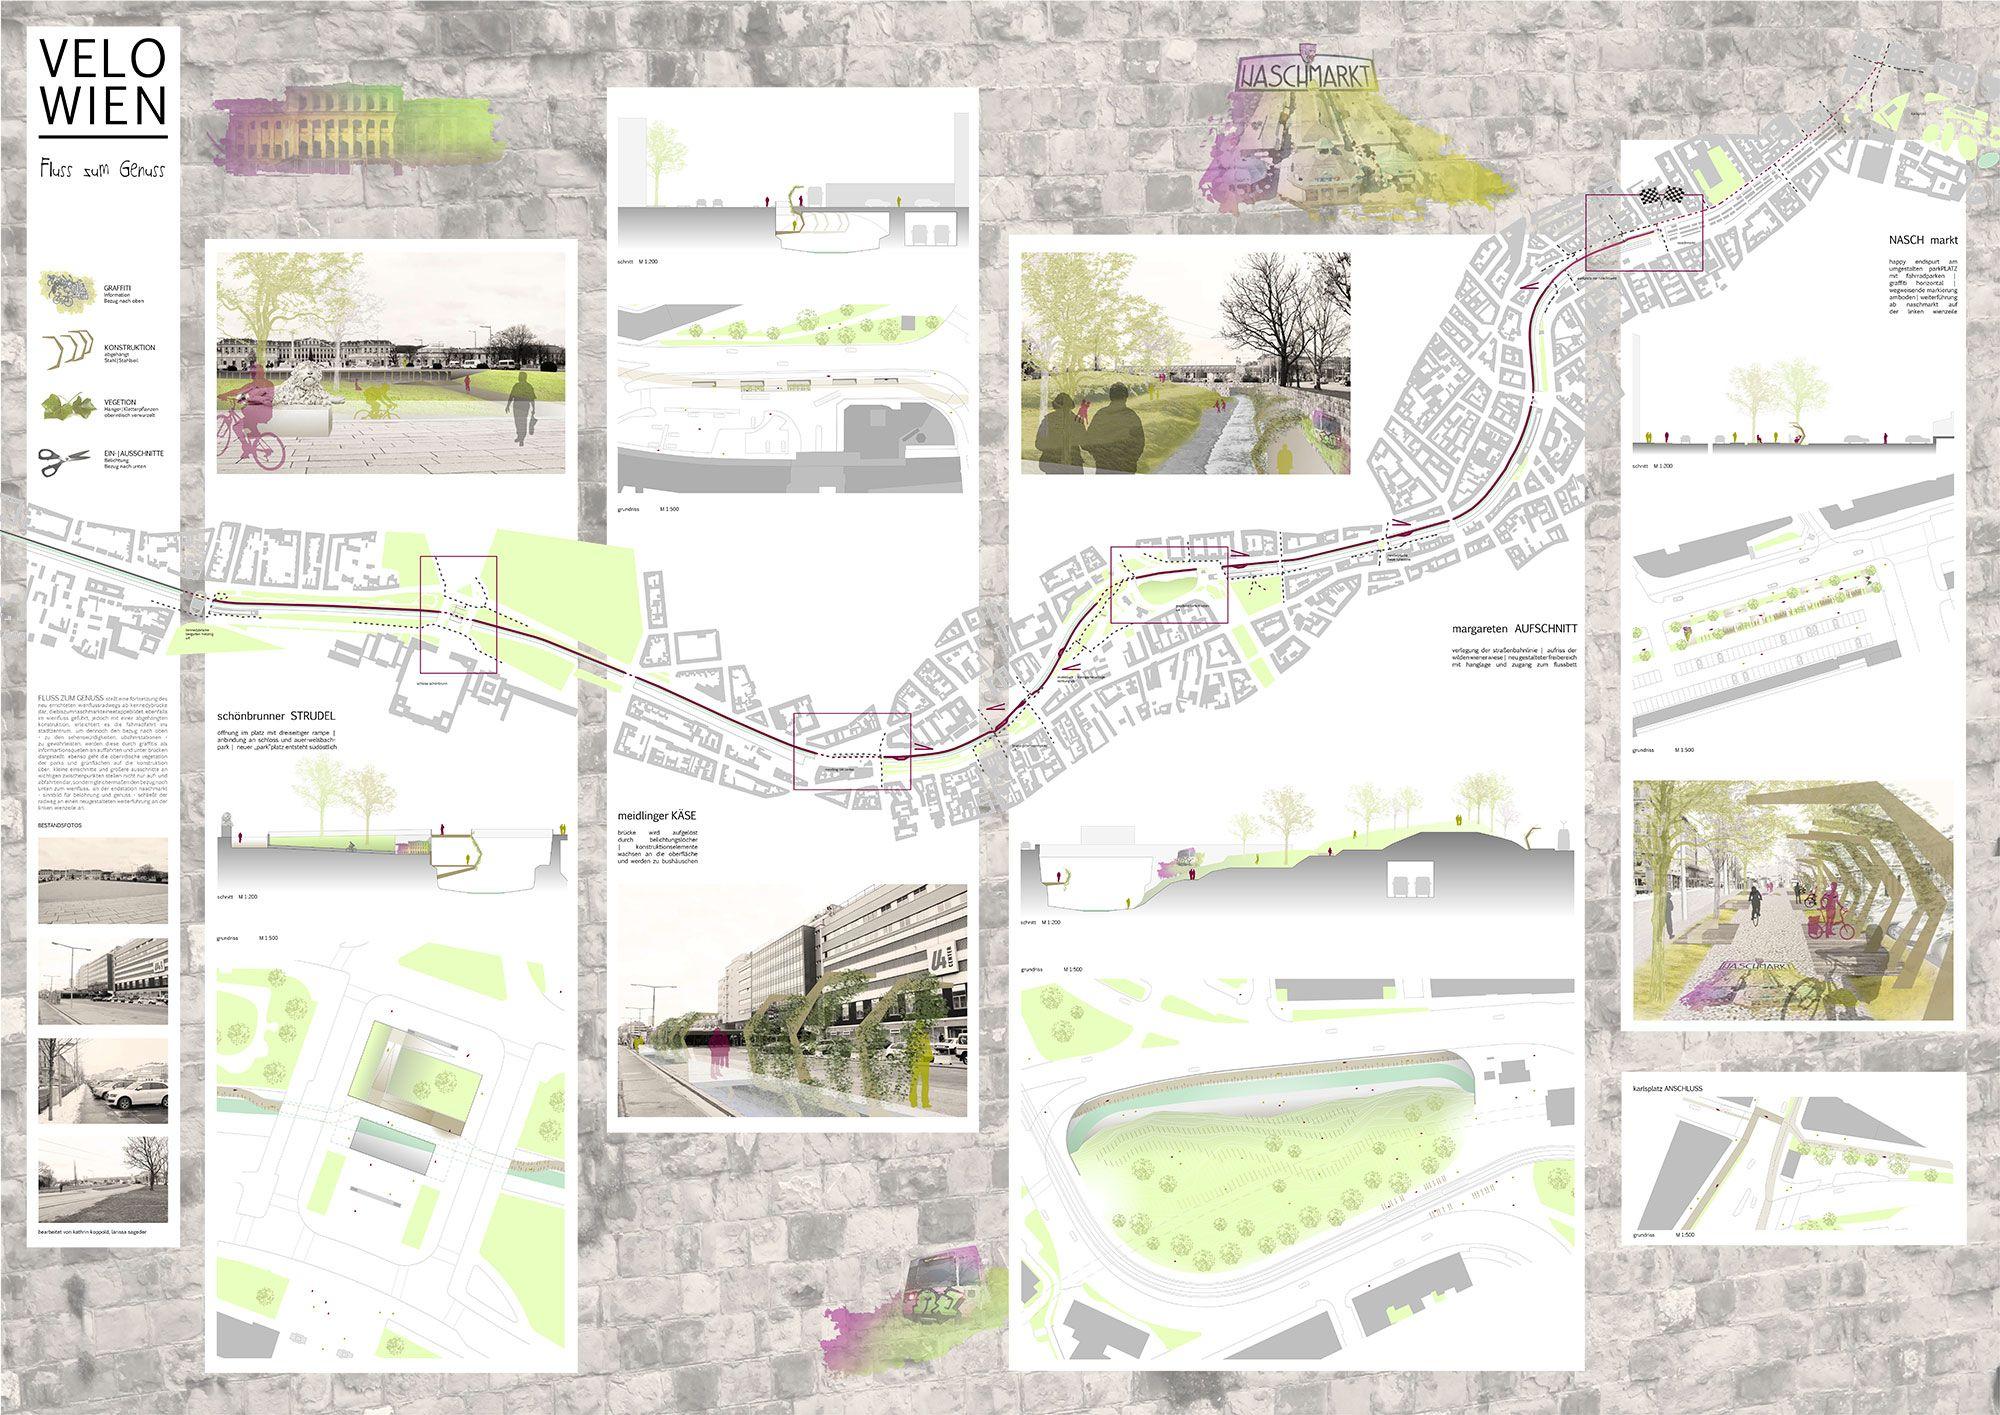 Architectural Siteysis Photoshop